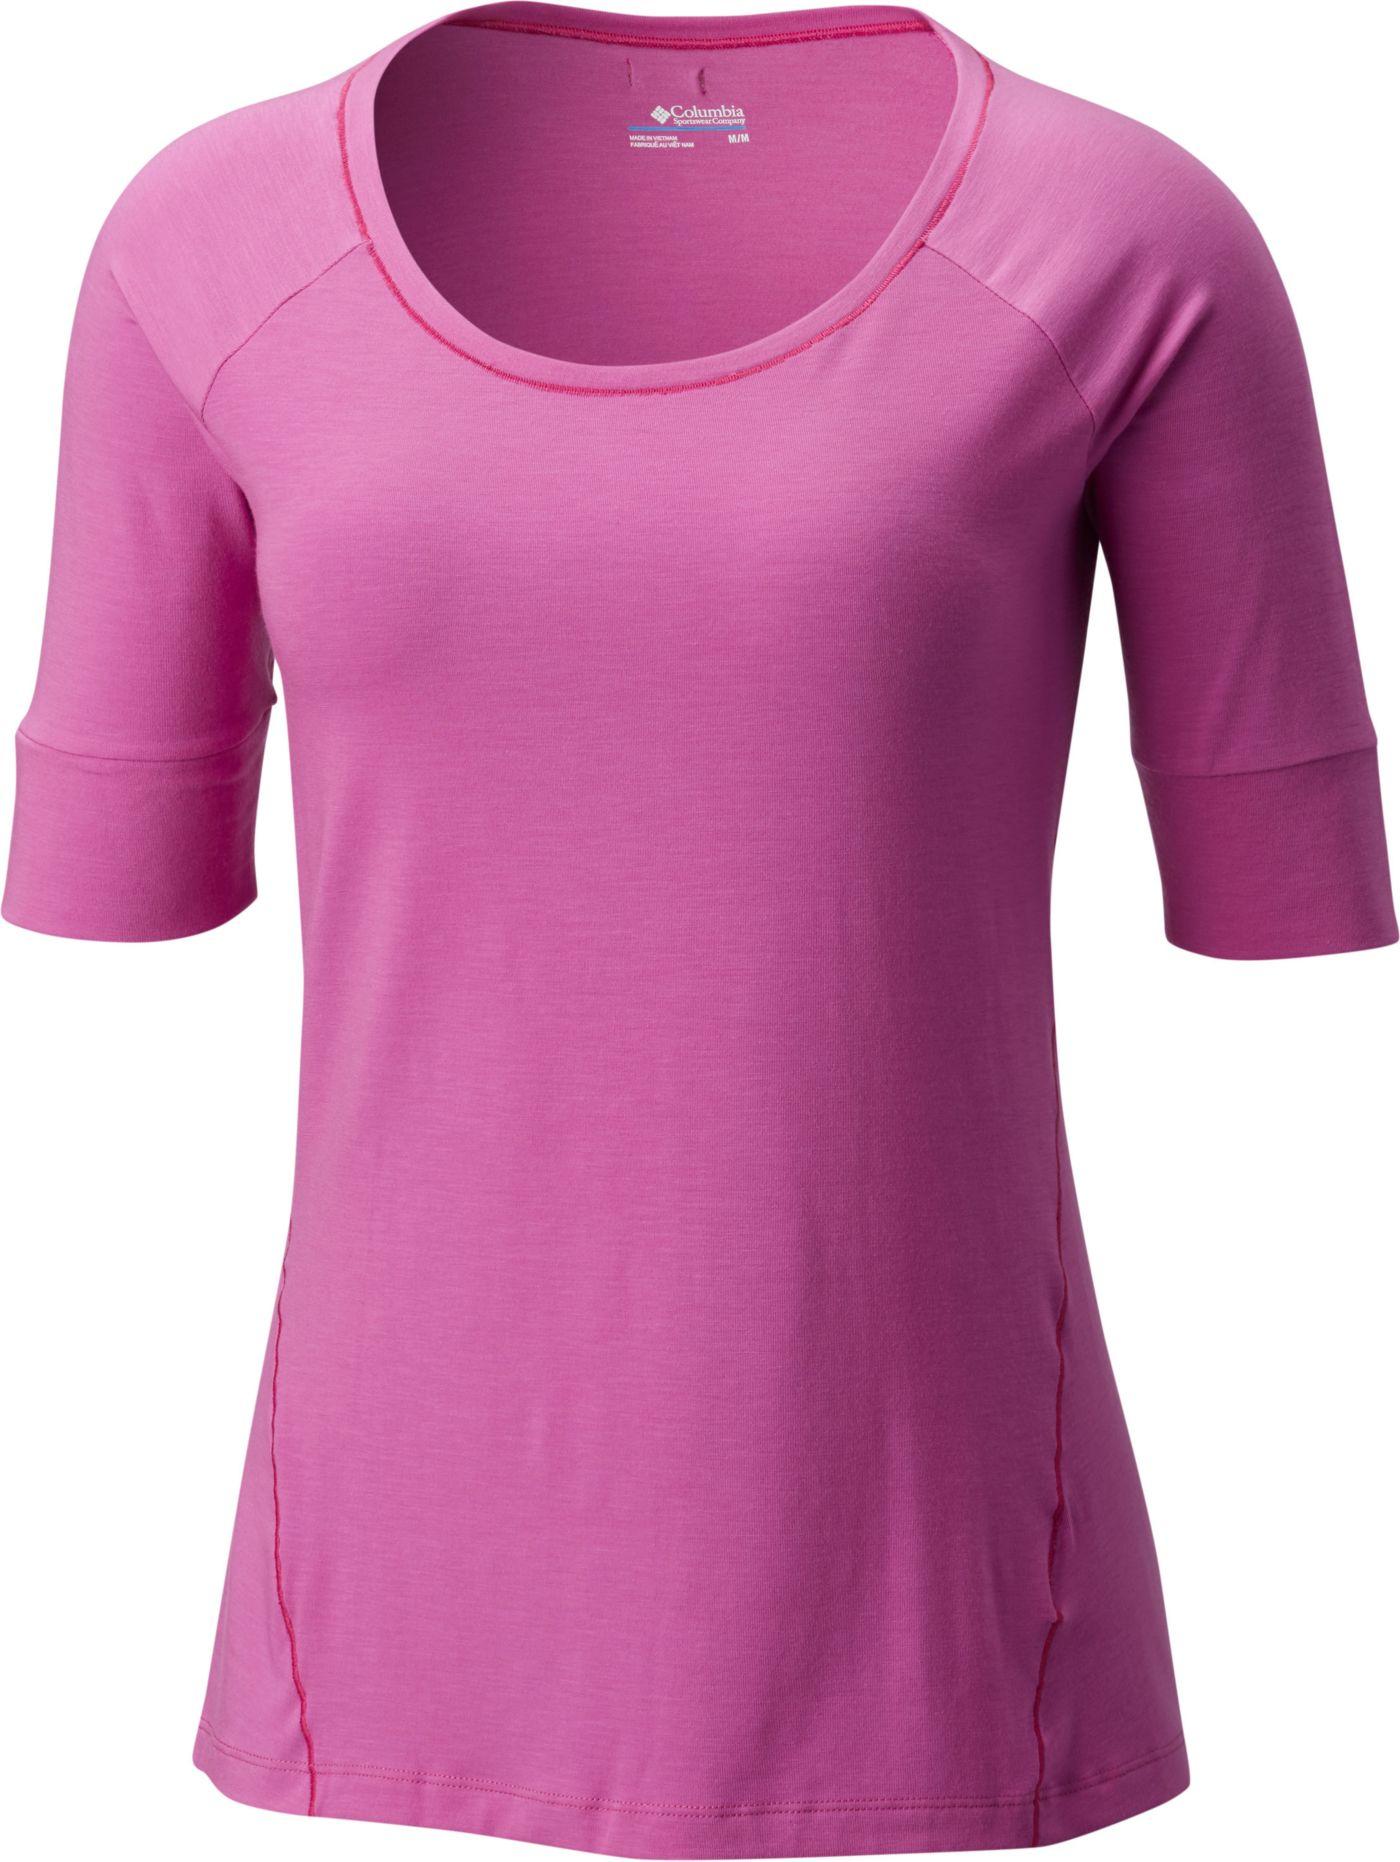 Columbia Women's Take It Easy T-Shirt